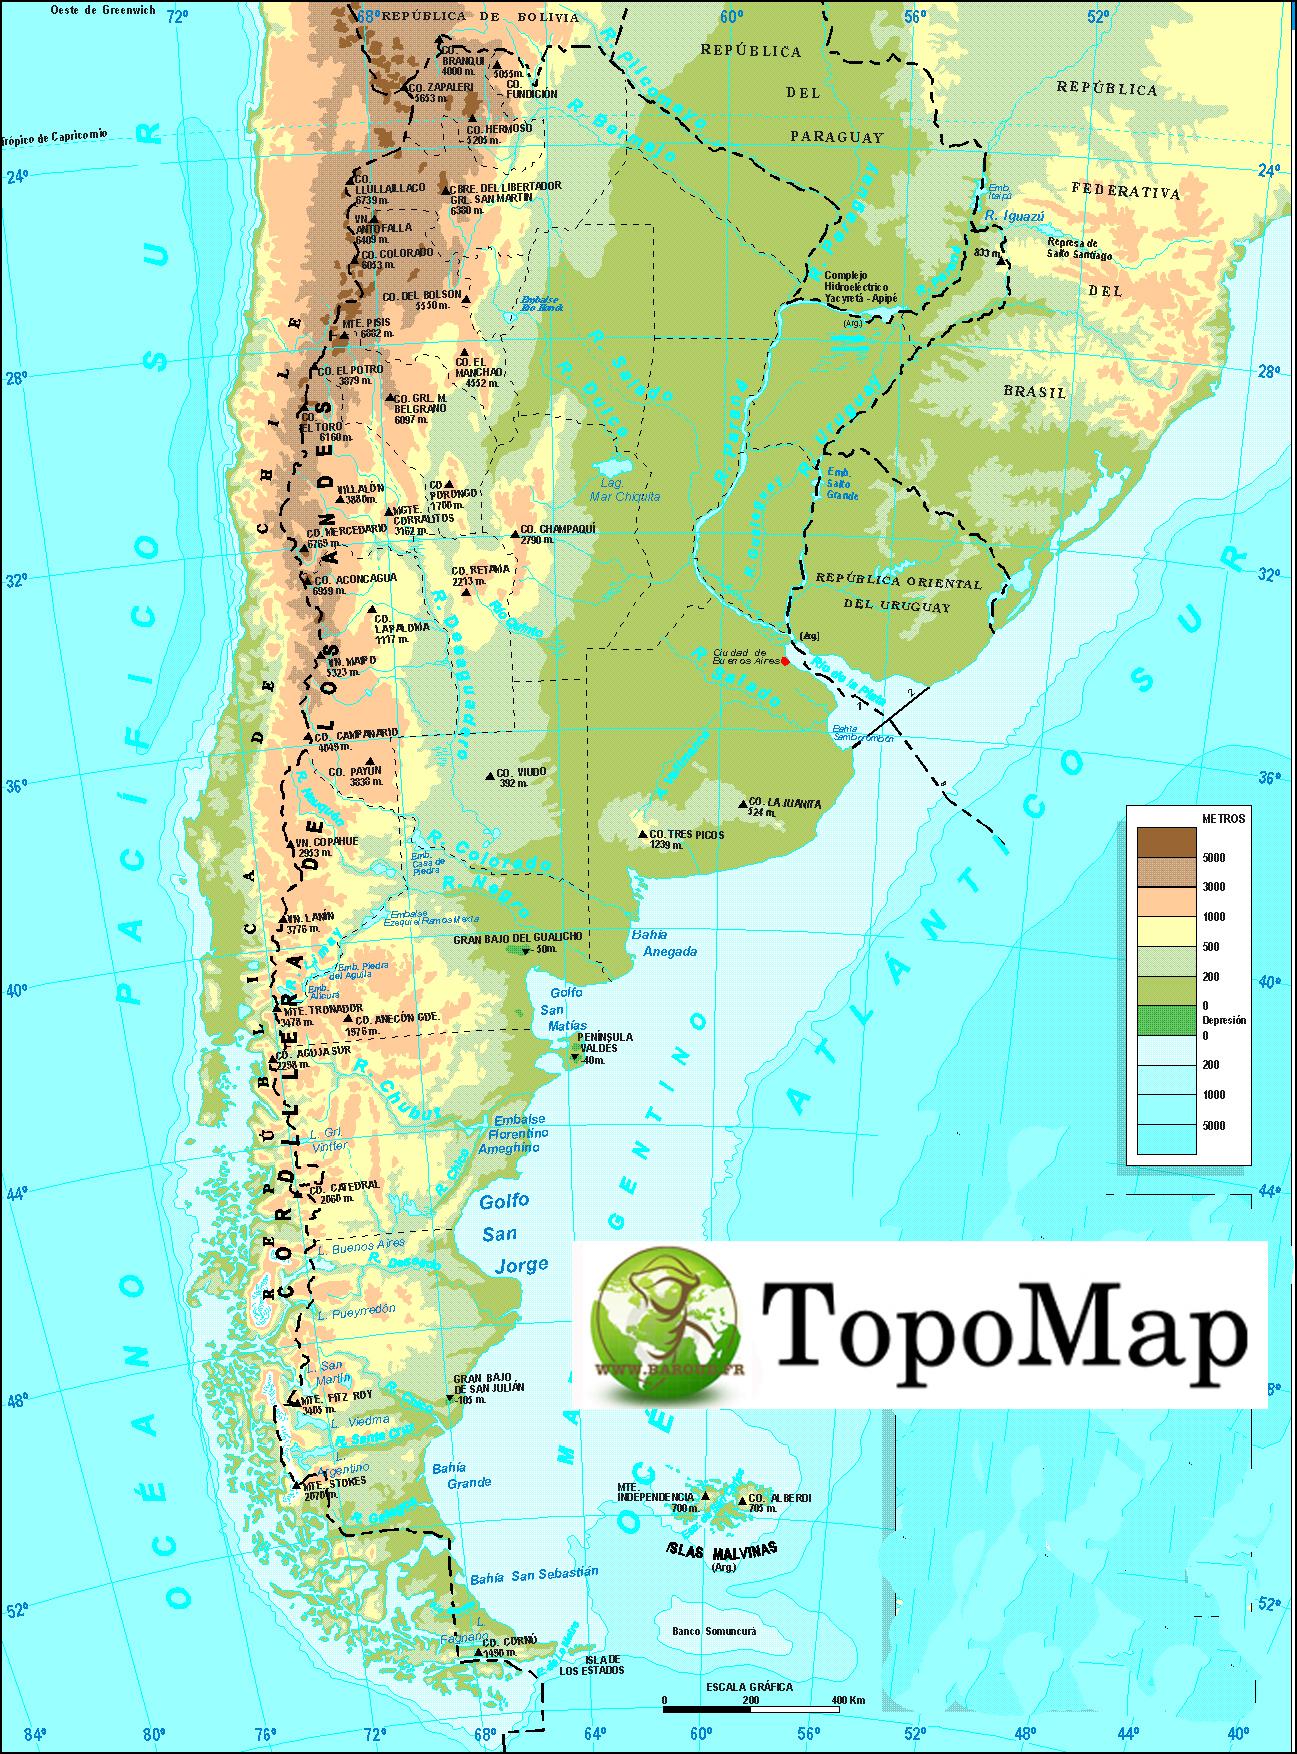 CARTE TOPO MAP GARMIN ARGENTINE